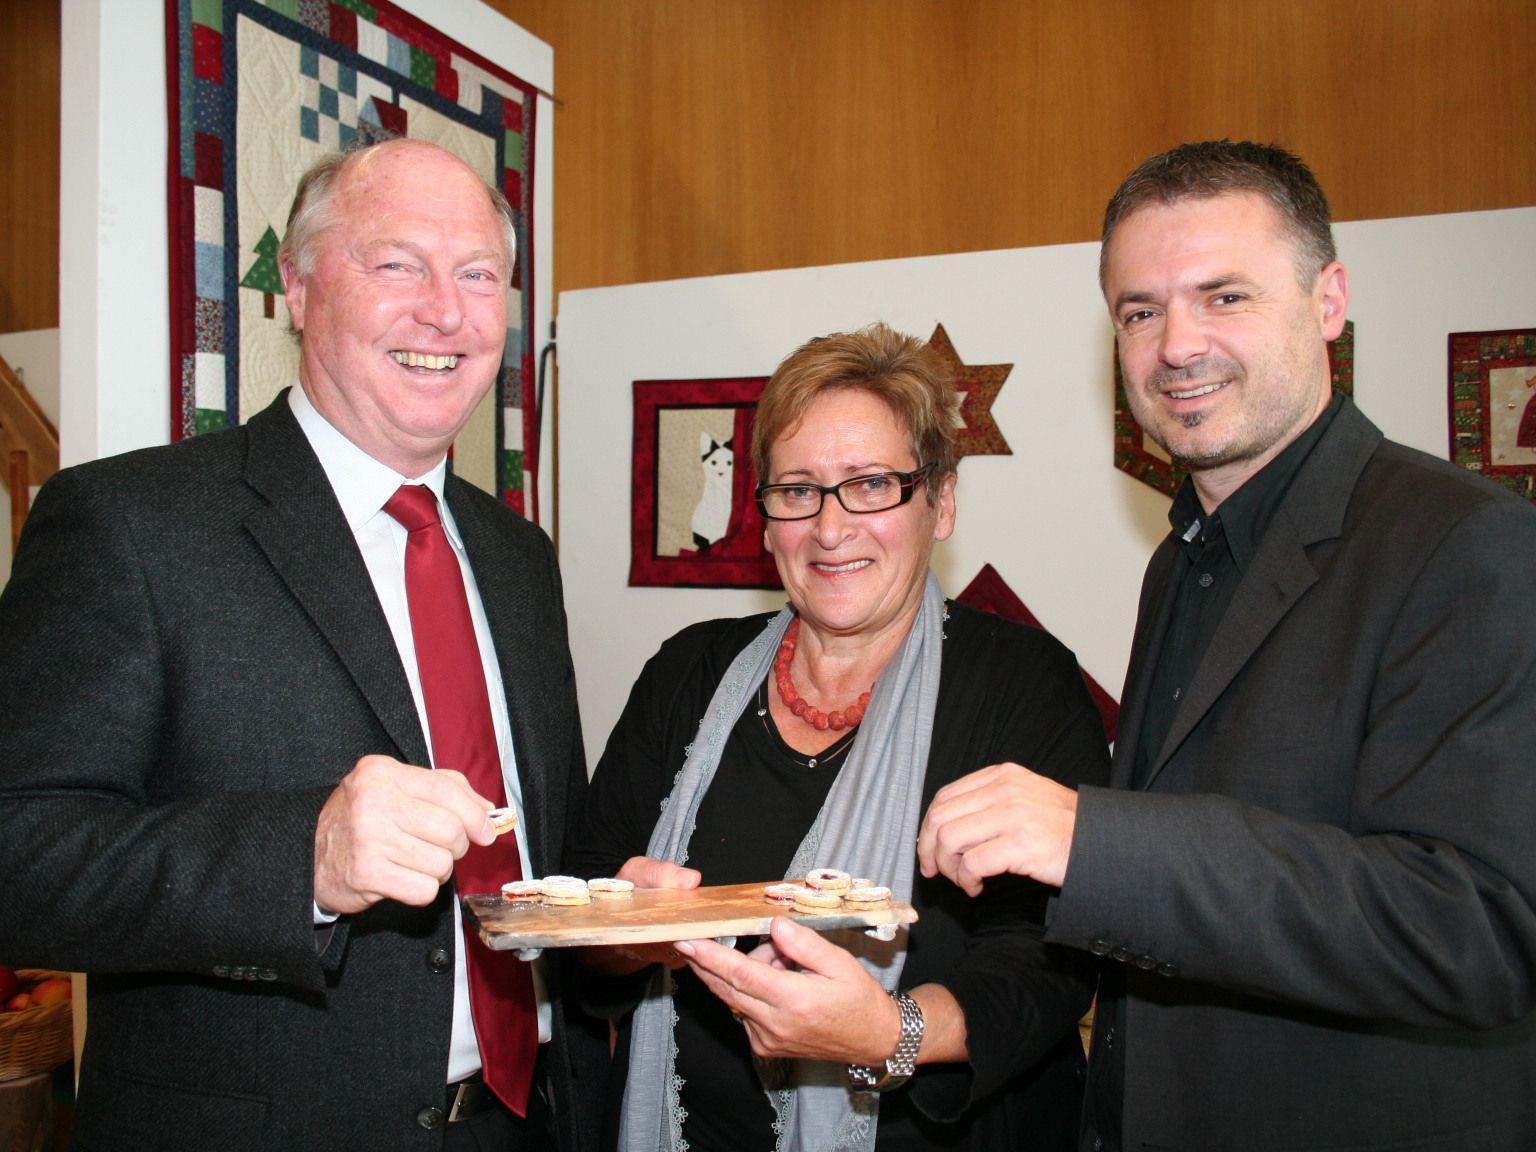 Bgm. Egon Troy mit dem Organisationsduo Elfriede Maurer und GR Walter Moosbrugger.